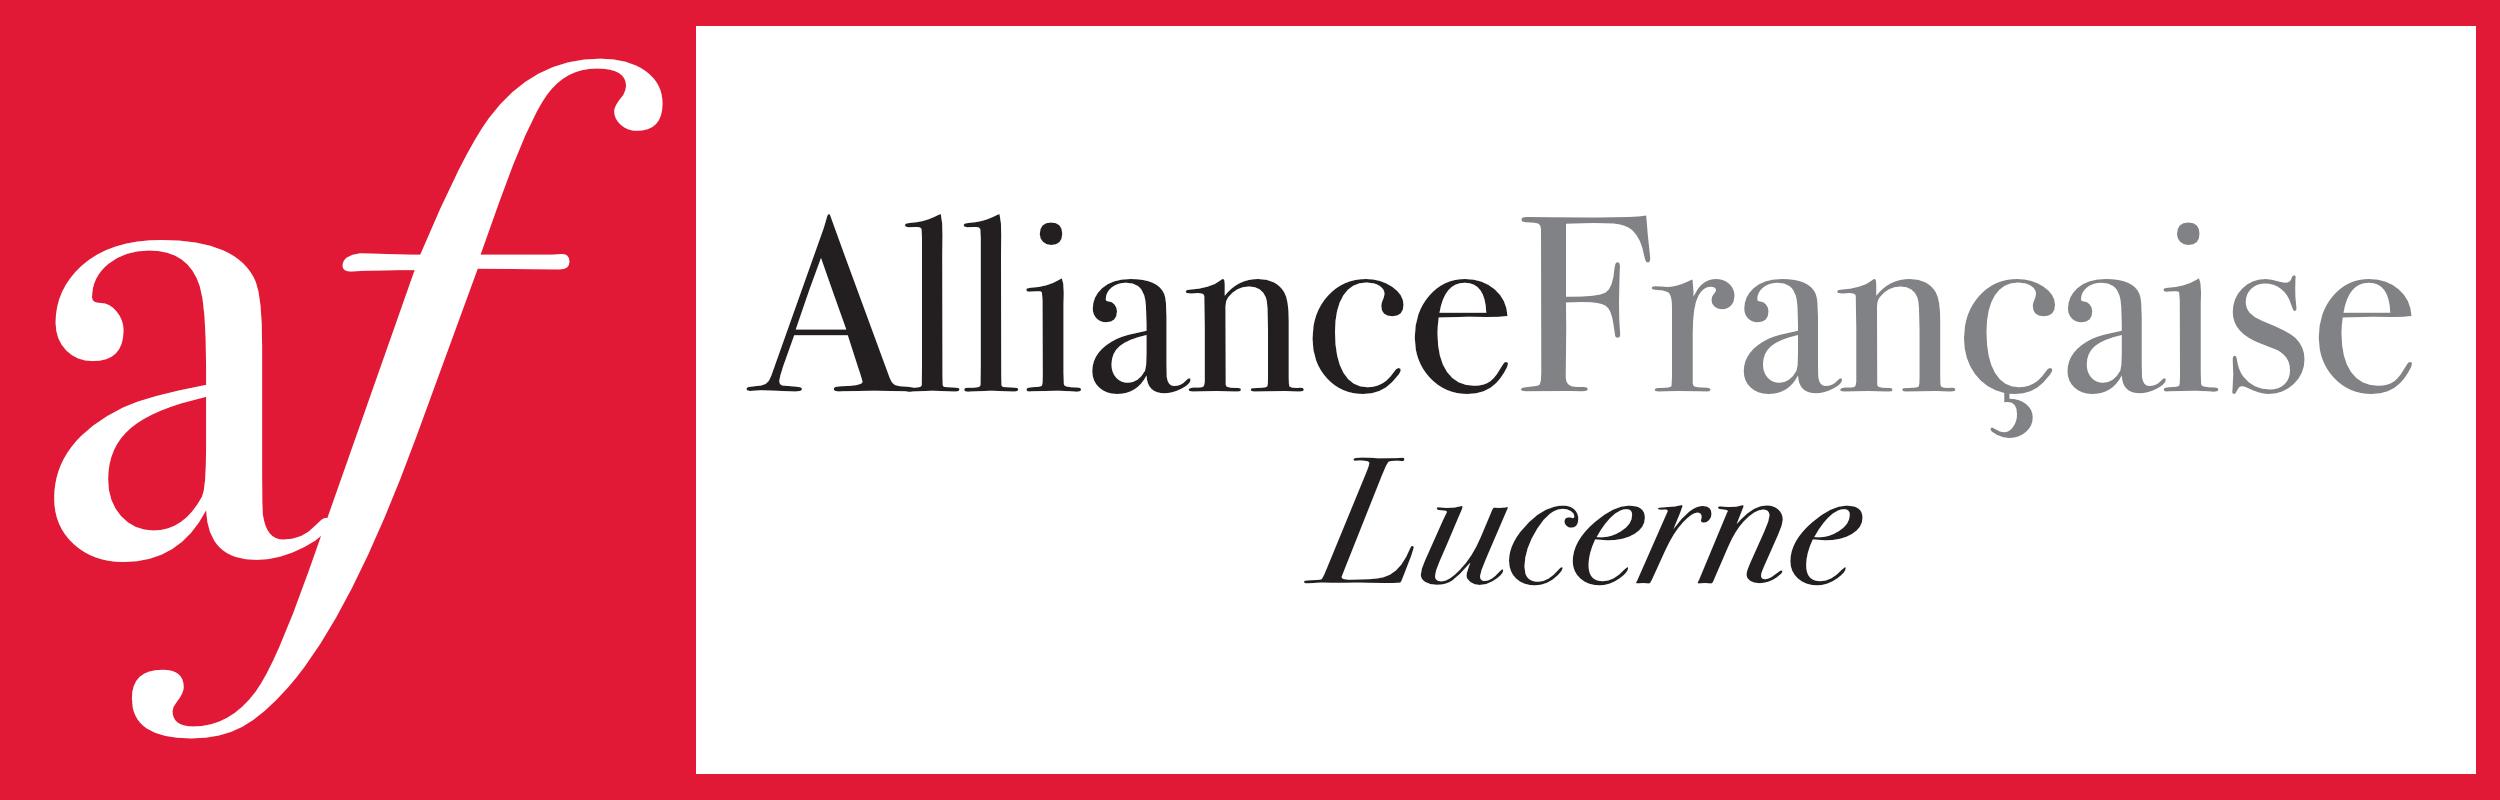 Alliance Française de Lucerne